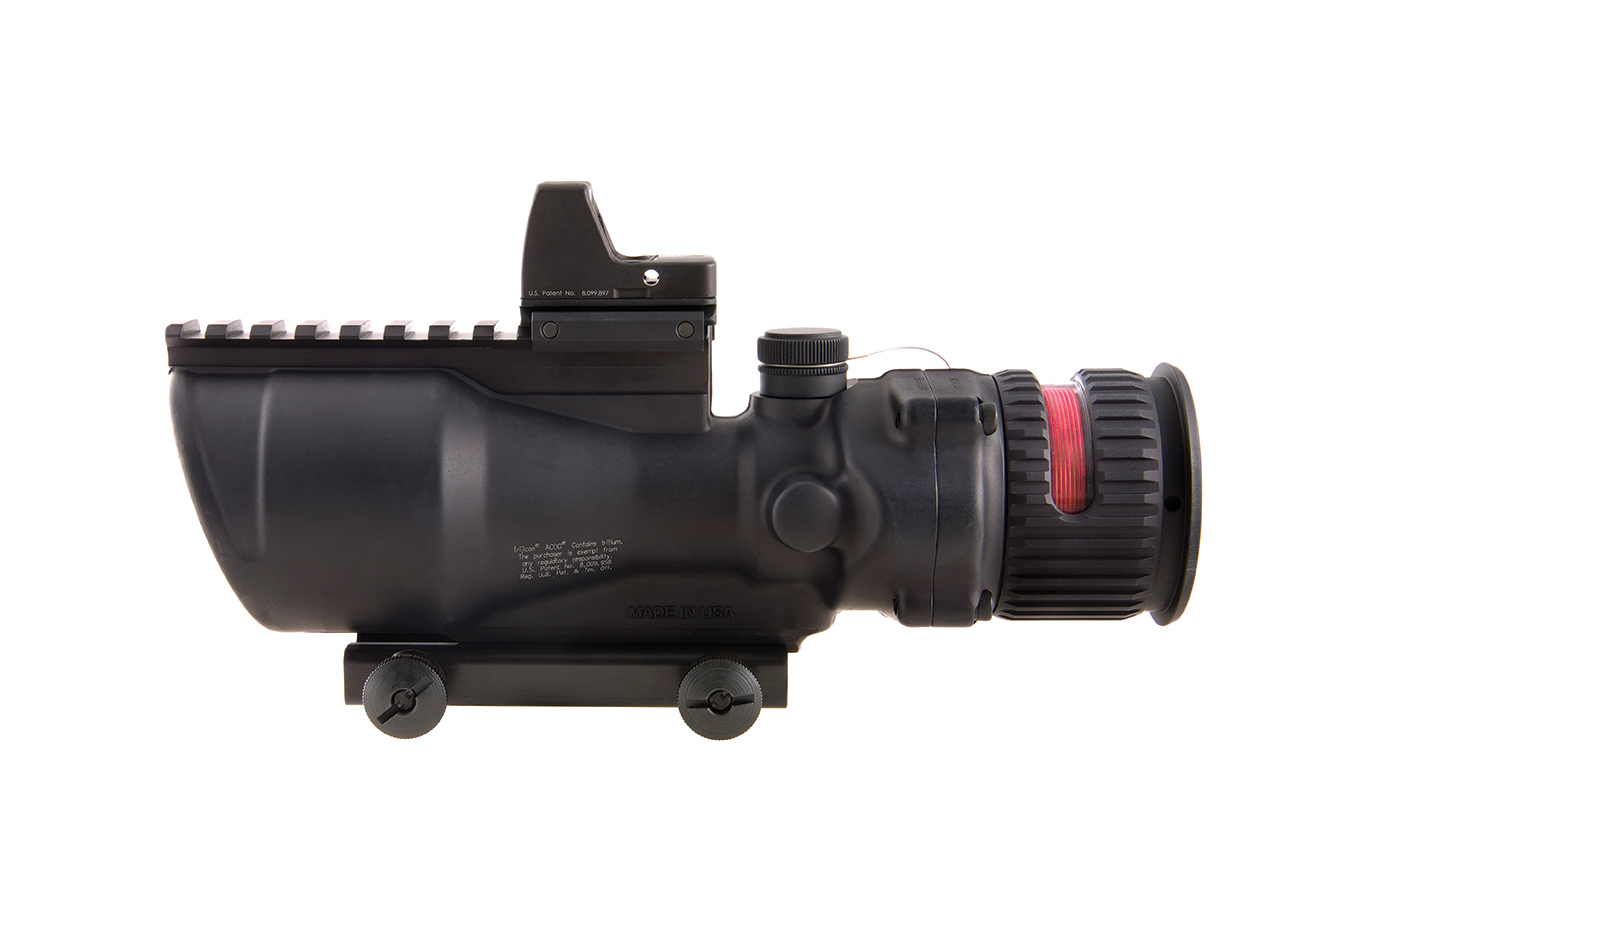 TA648-D-100559 angle 2